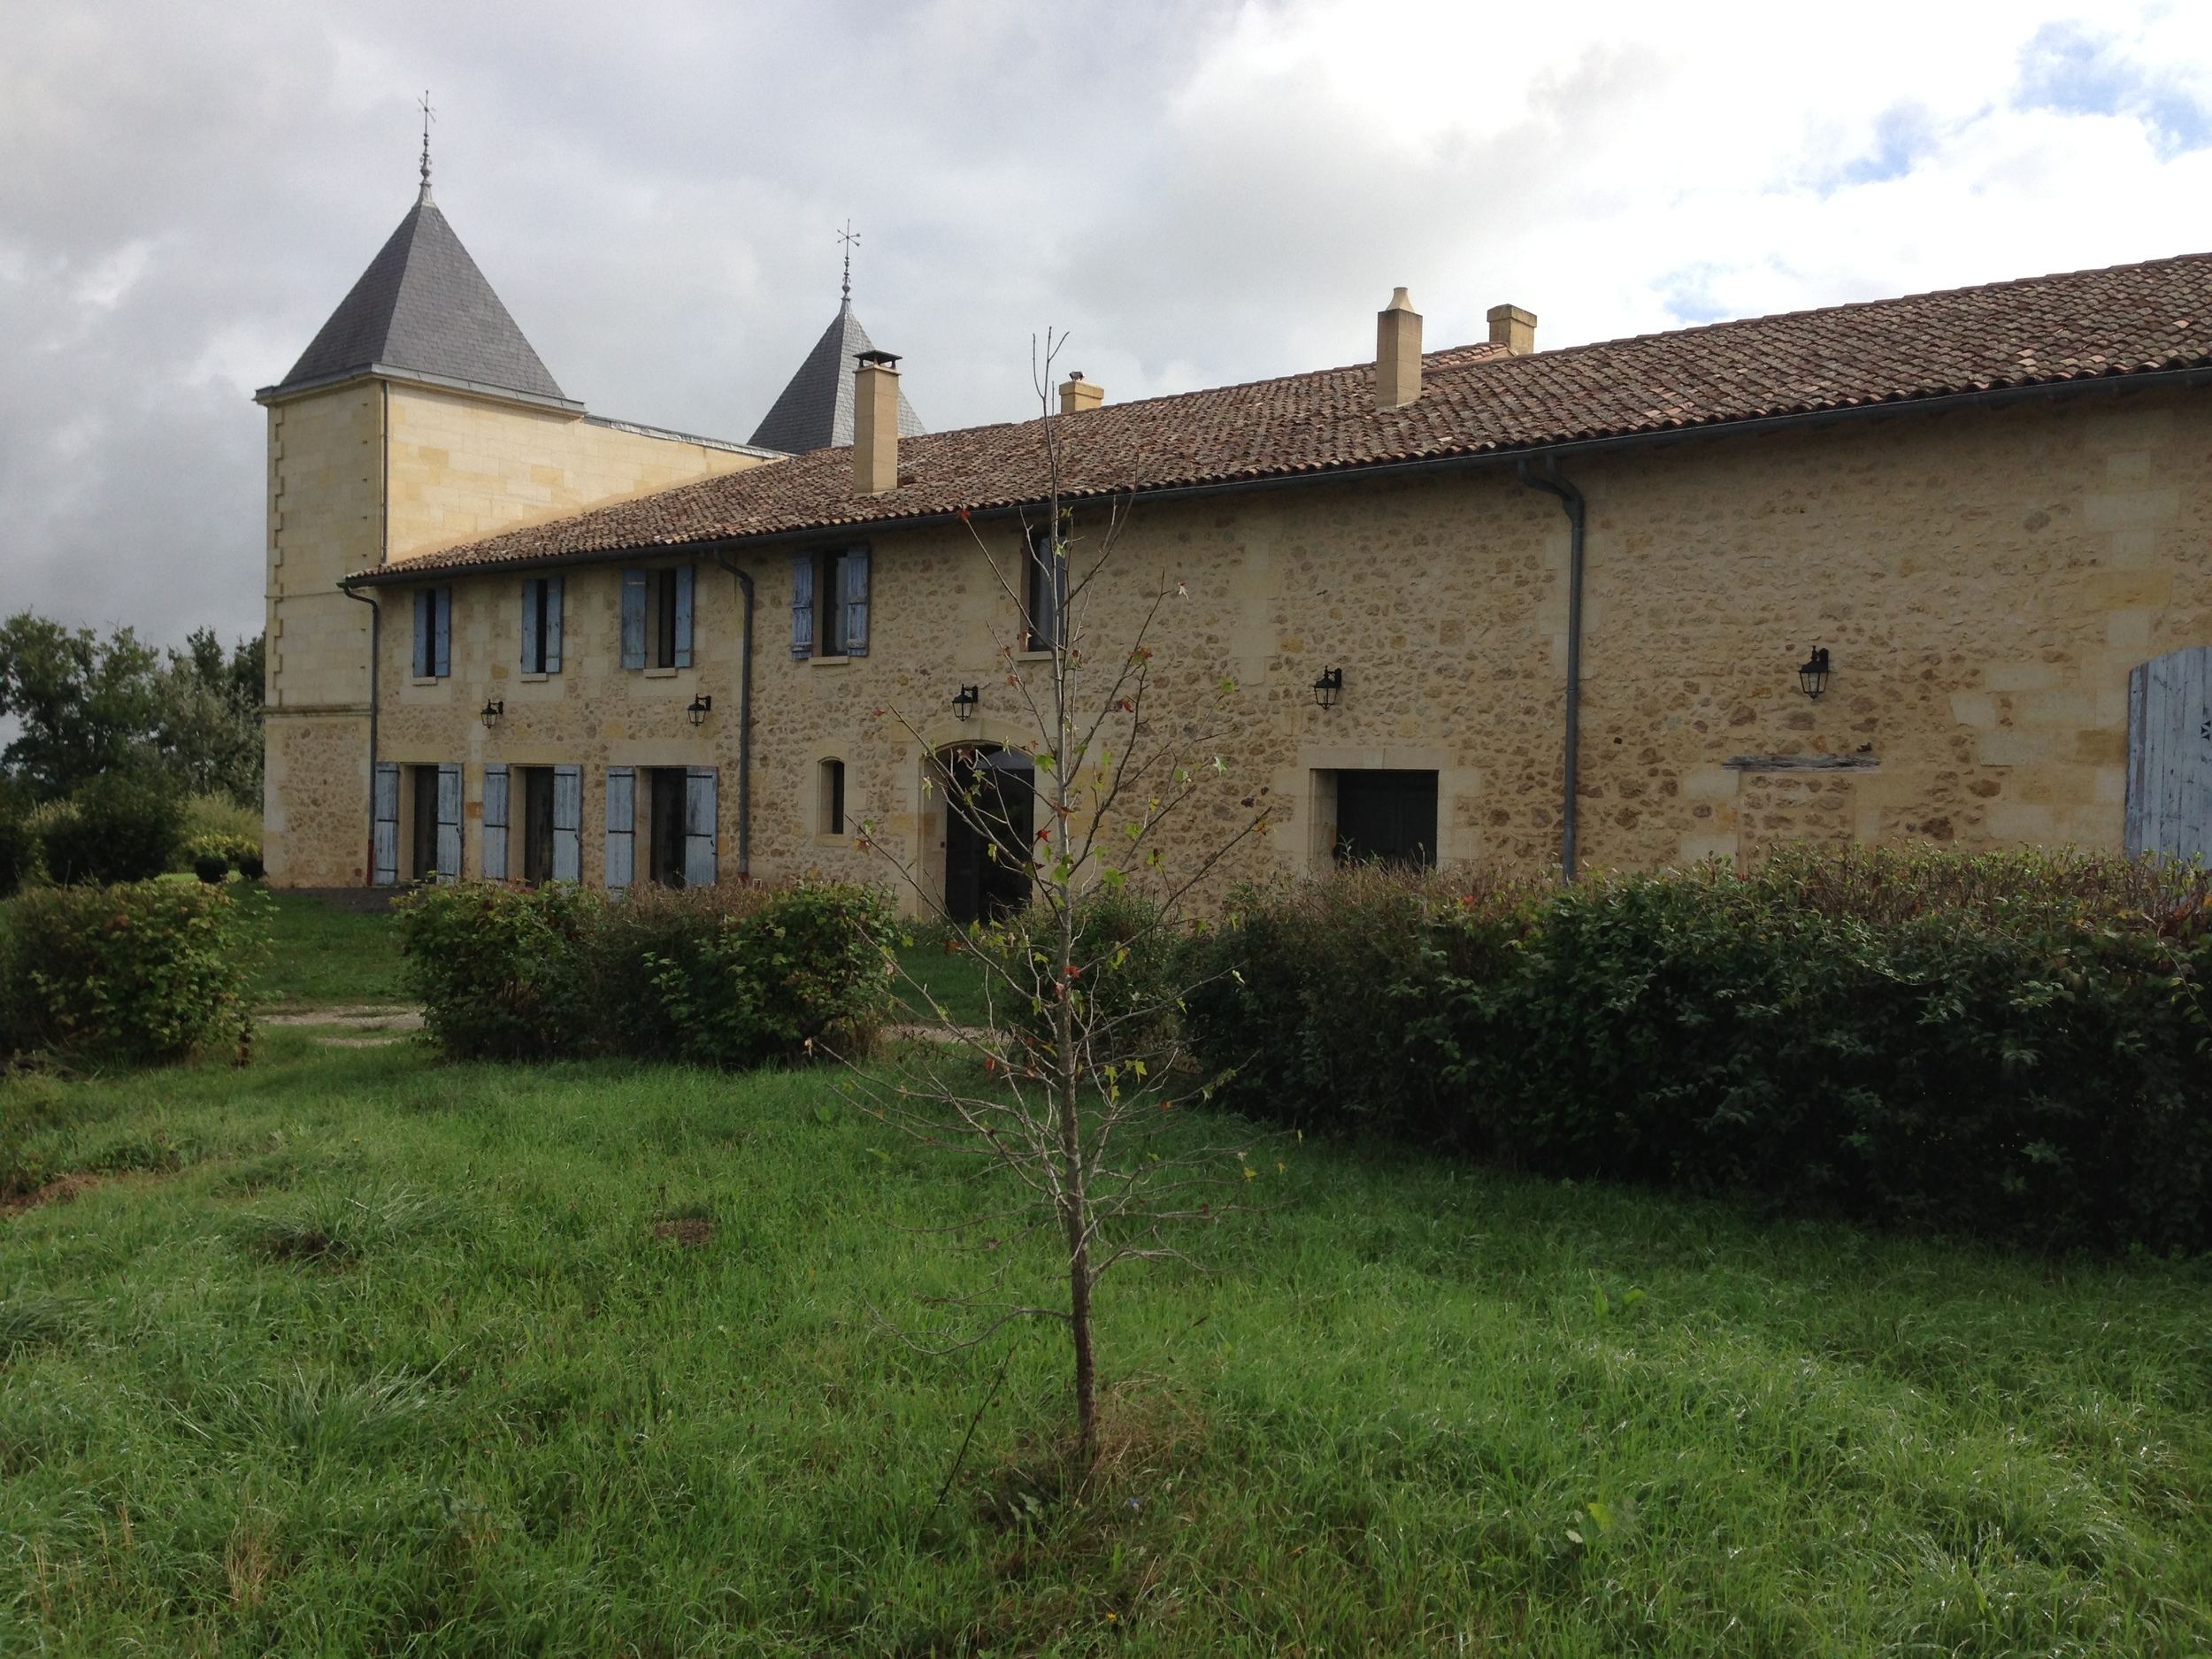 A liquidamber tree planted at Chateau Gastineau, Bordeaux. The home of Ann's lifelong friend, Martine Gougam.